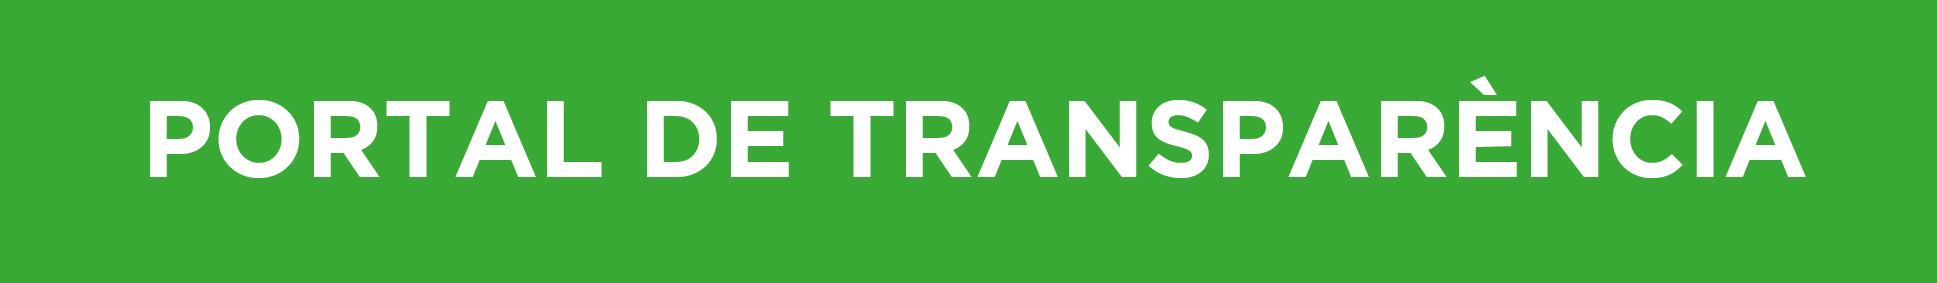 boton-transparencia-01